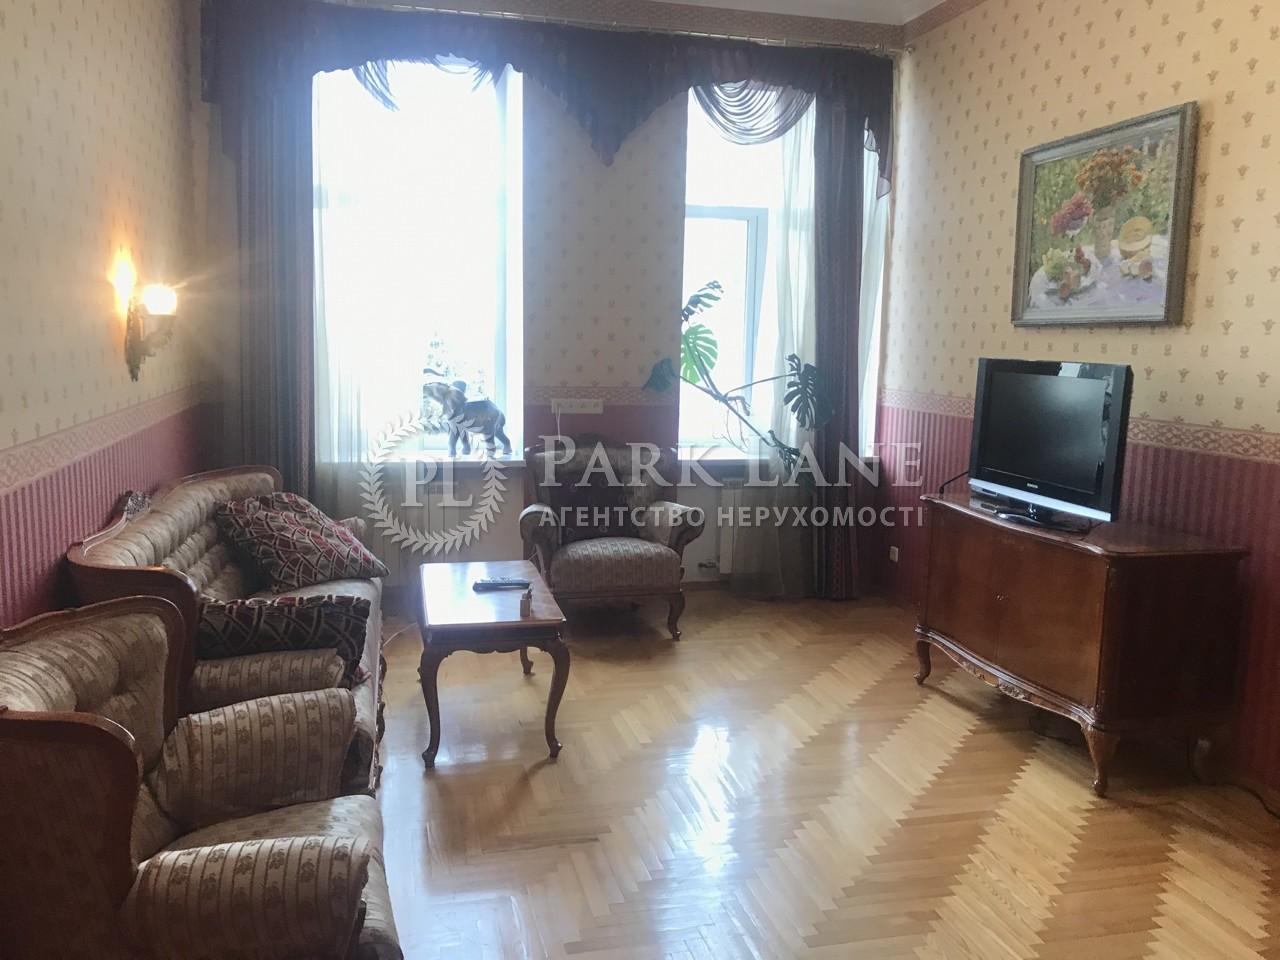 Квартира ул. Сечевых Стрельцов (Артема), 55, Киев, J-17430 - Фото 3